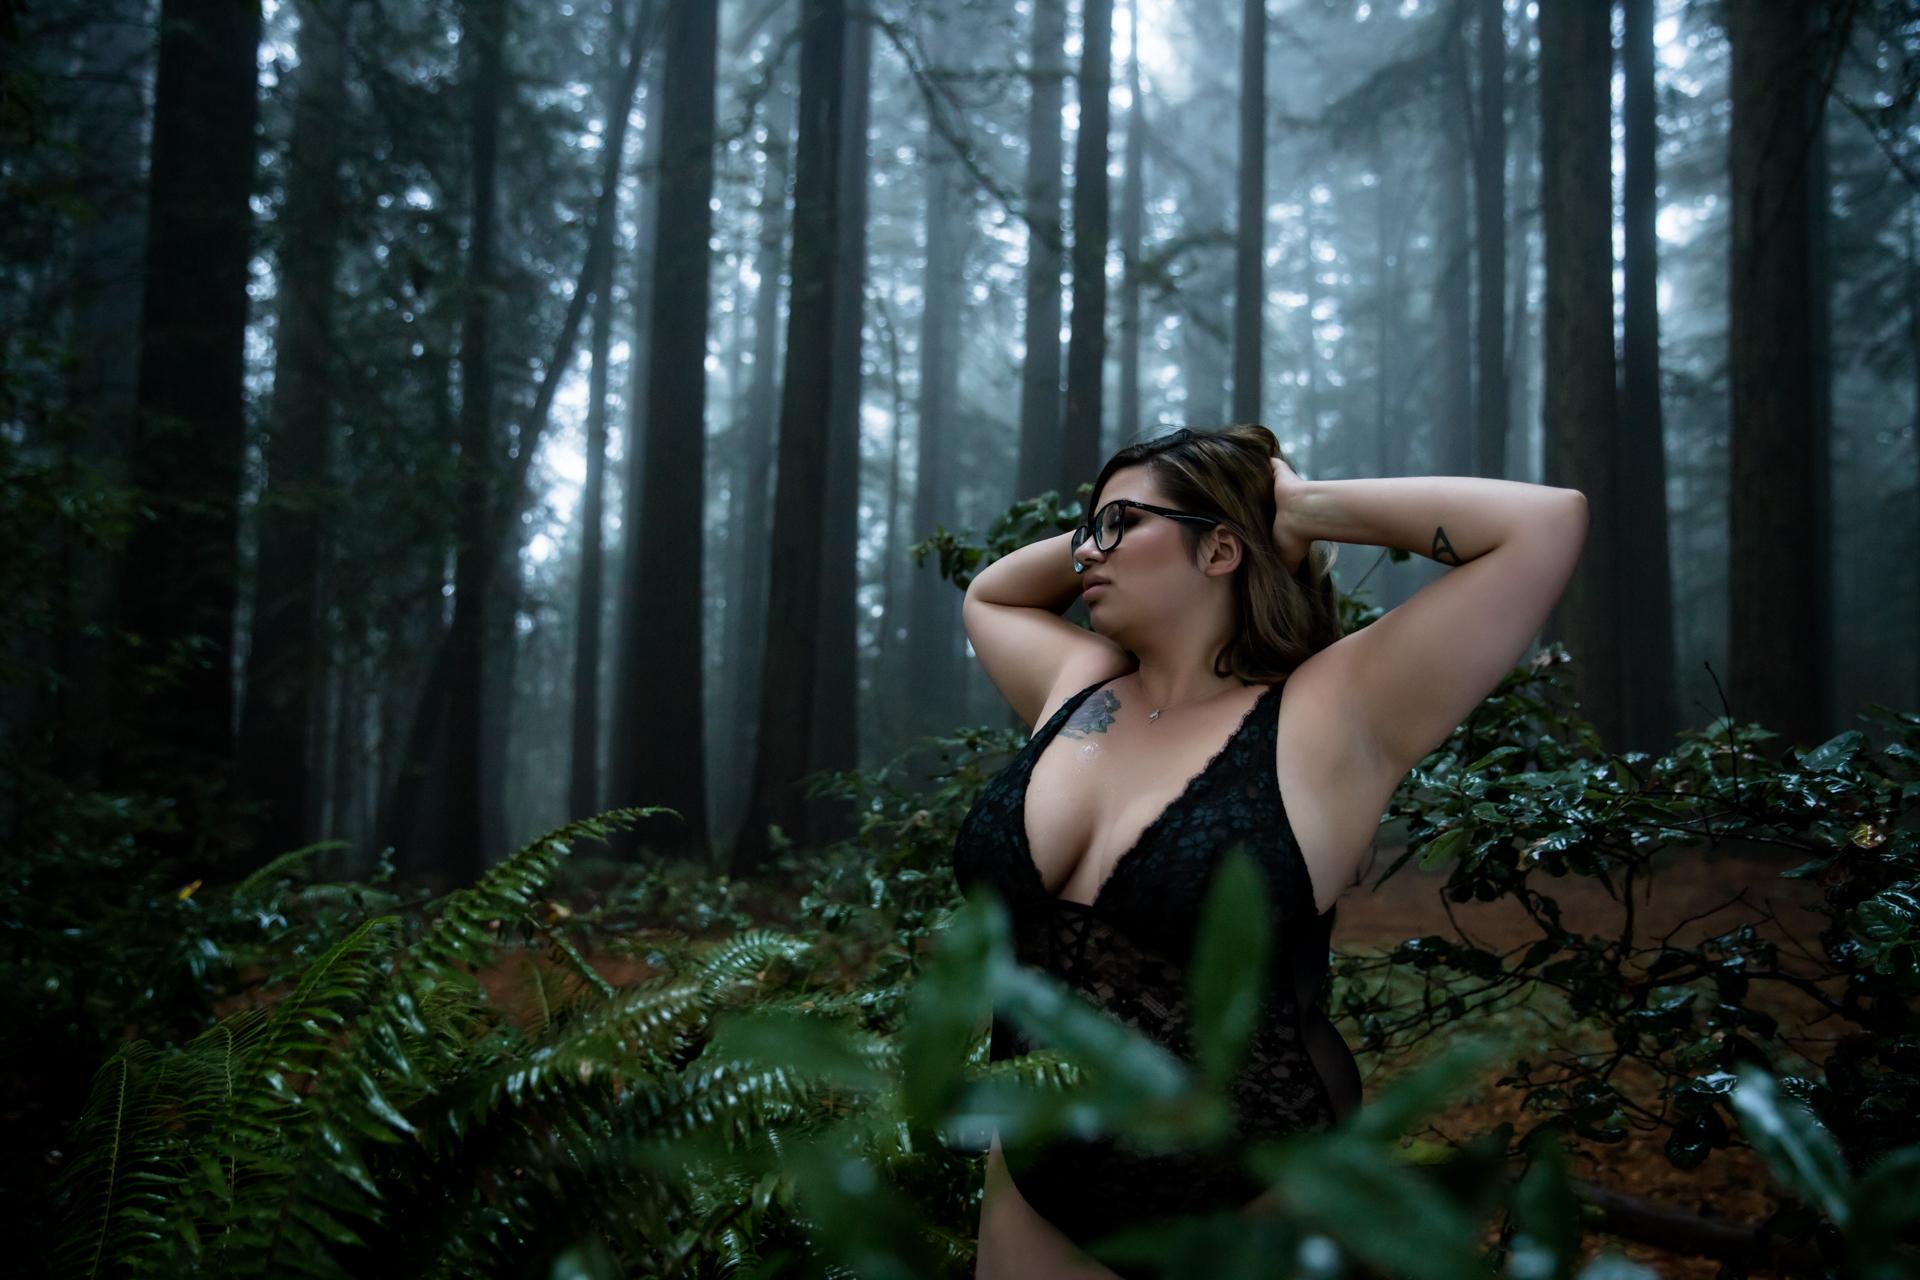 Outdoor Boudoir Adventures in Sonoma County